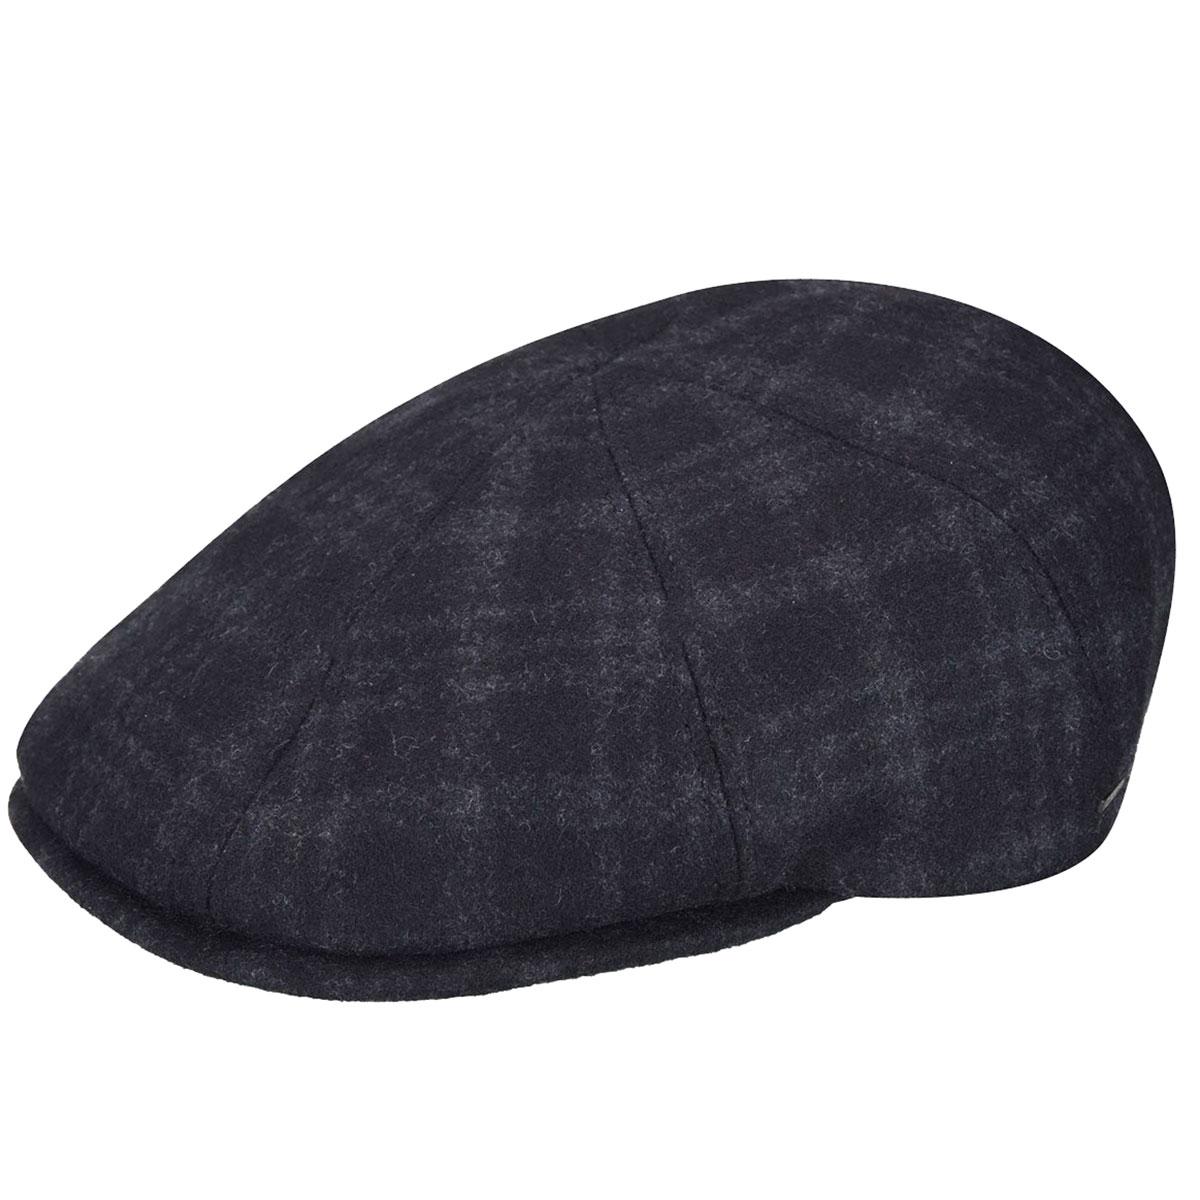 1920s Mens Hats & Caps | Gatsby, Peaky Blinders, Gangster Cove Dockman Cap $48.00 AT vintagedancer.com